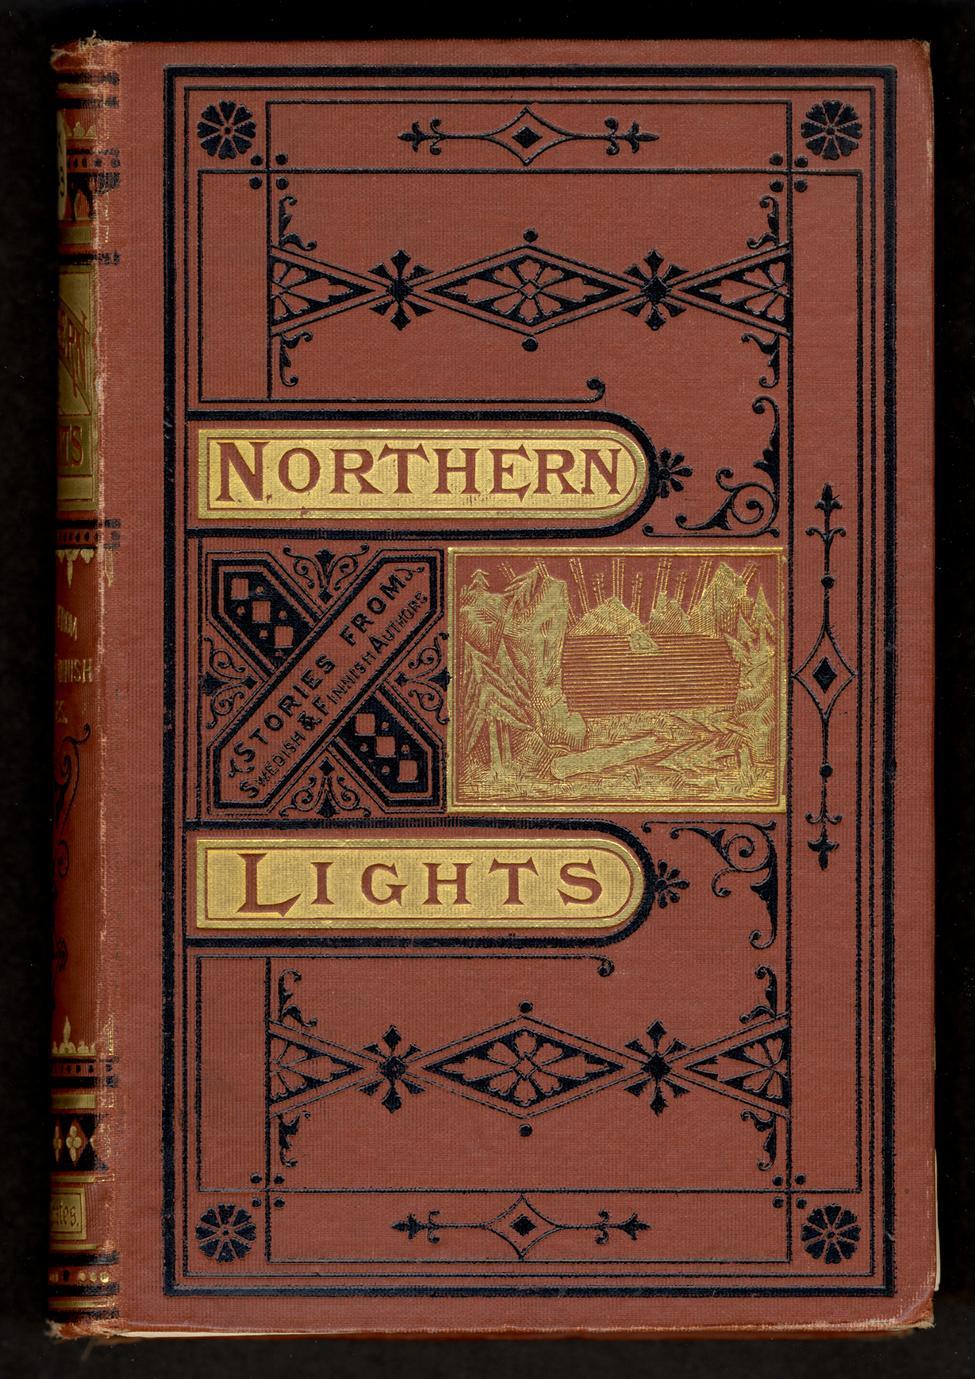 Northern lights (1 of 3)